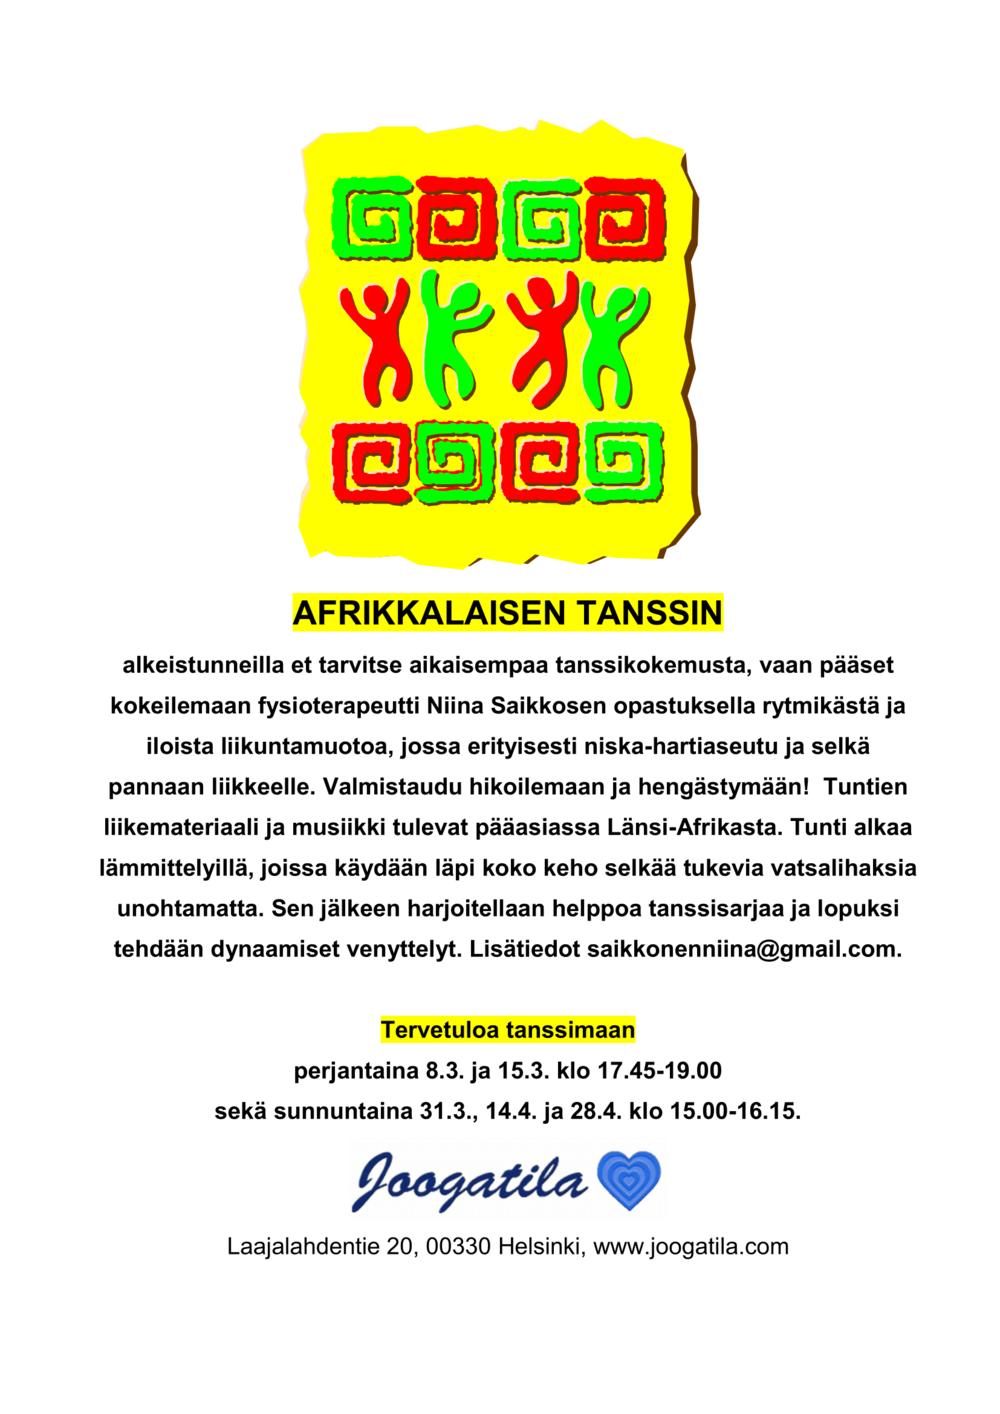 Afro Joogatila kevät 2019-1.png